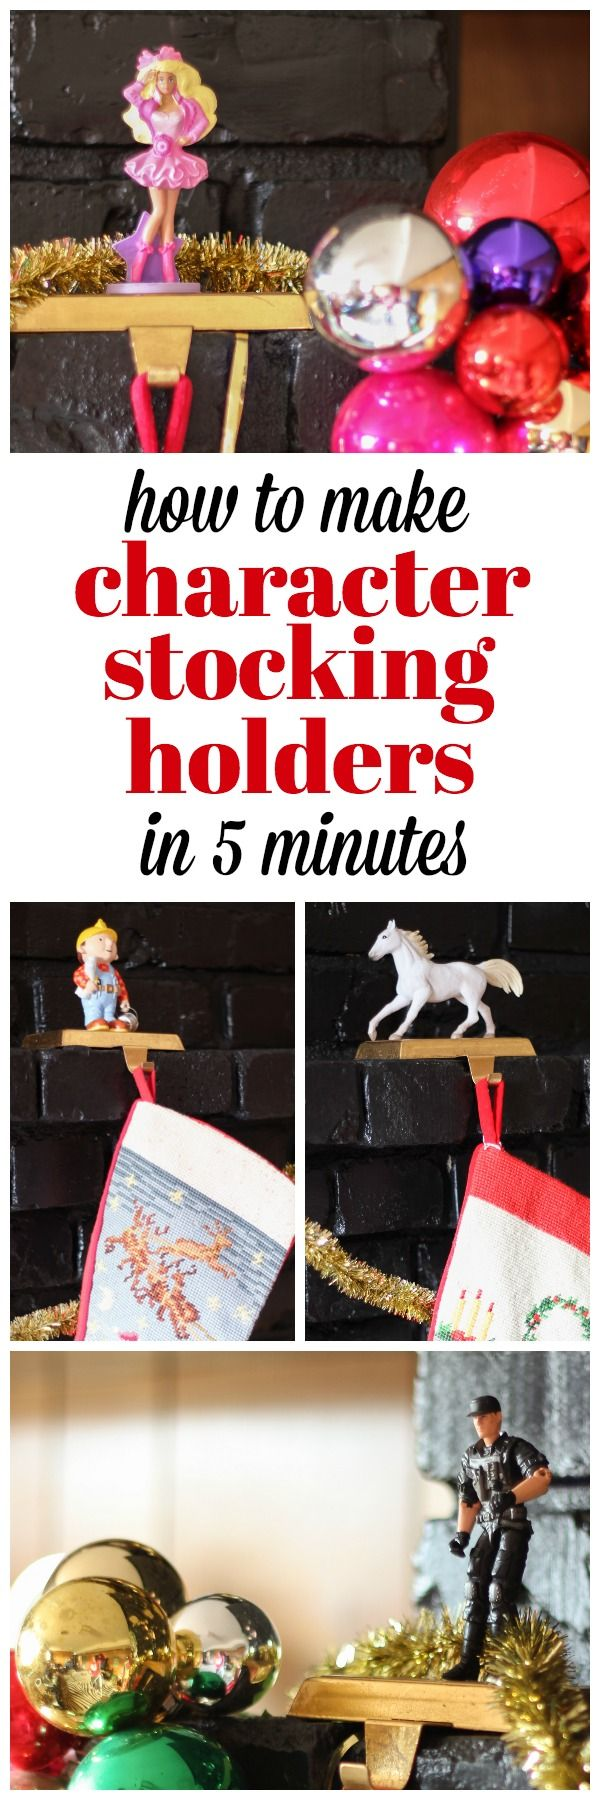 DIY Stocking Holder Make Unique Stocking Hangers in Five